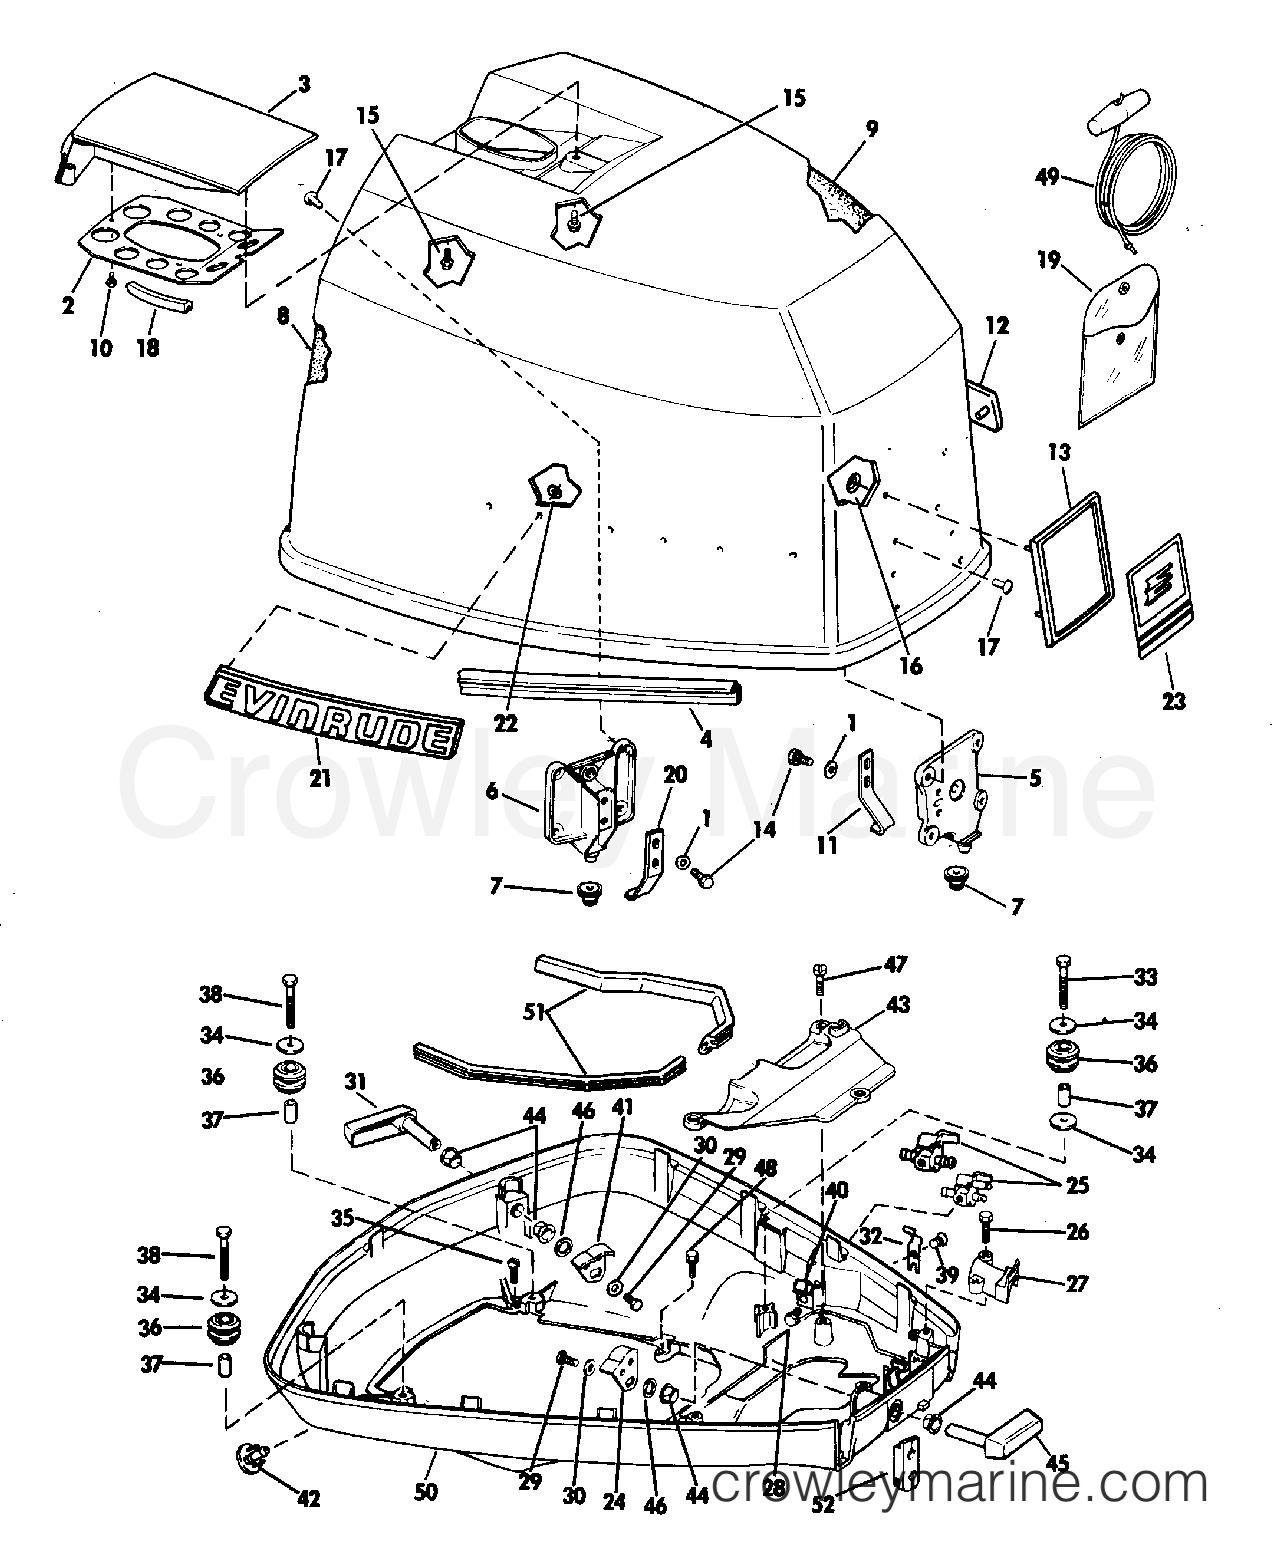 Motor Cover Evinrude